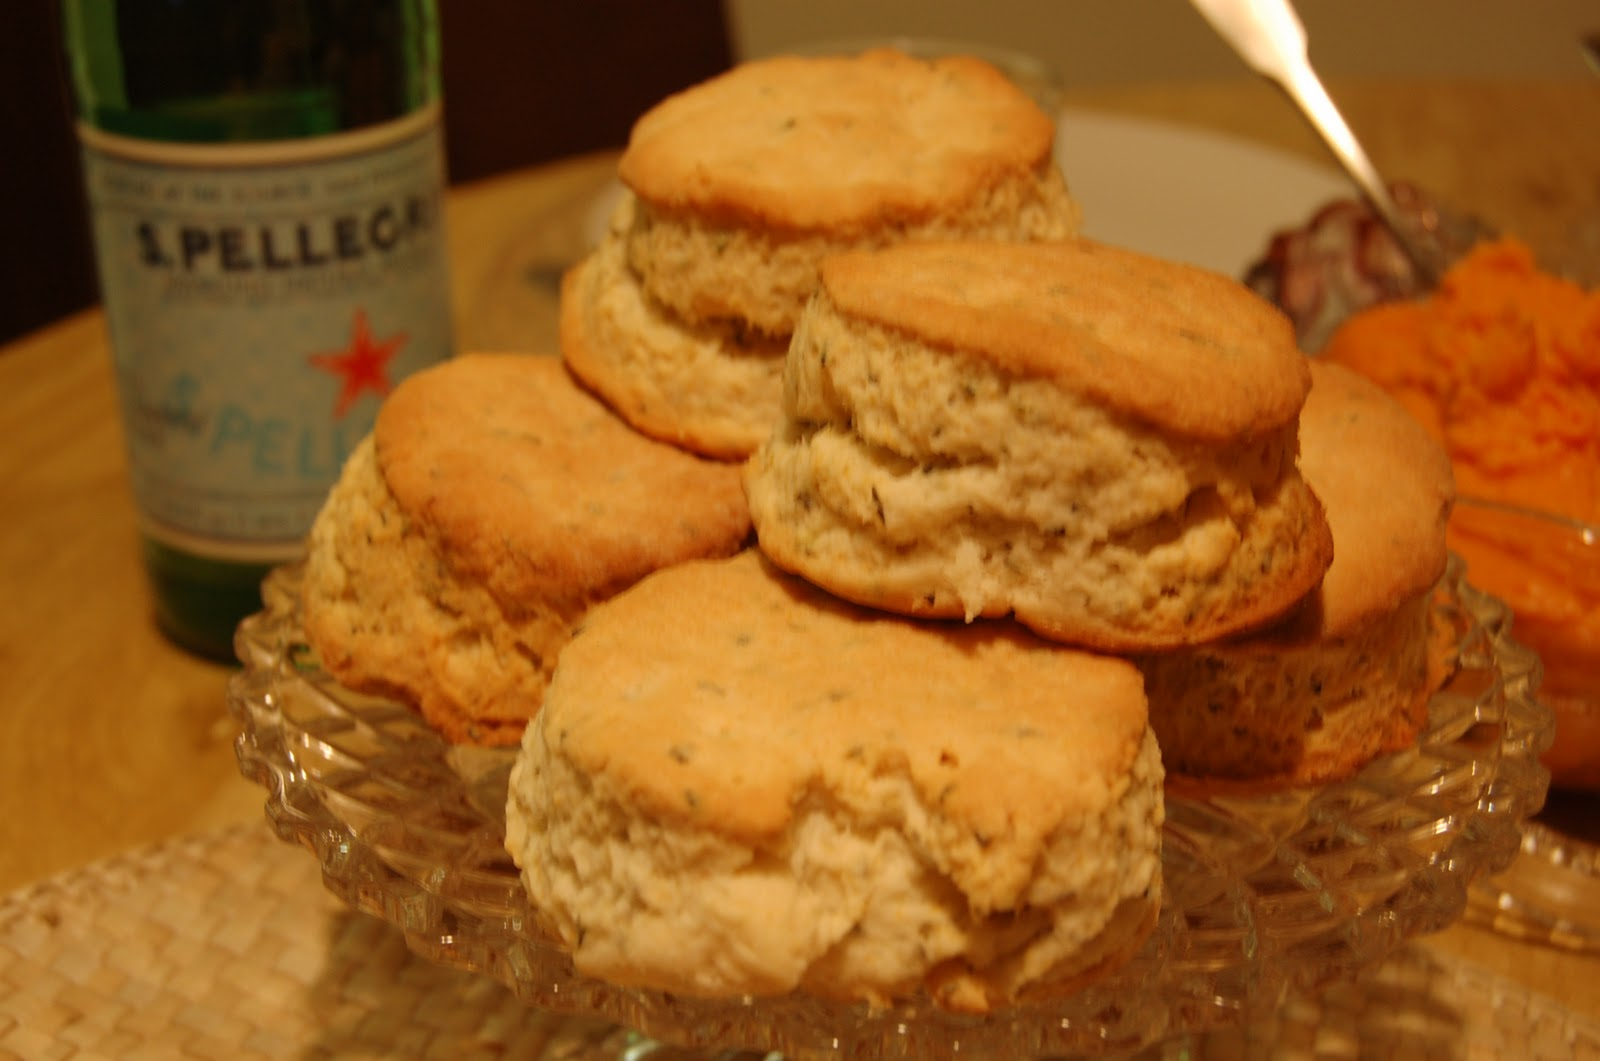 Bread + Butter: Thanksgiving Dish #2 - Honey-Herb Buttermilk Biscuits